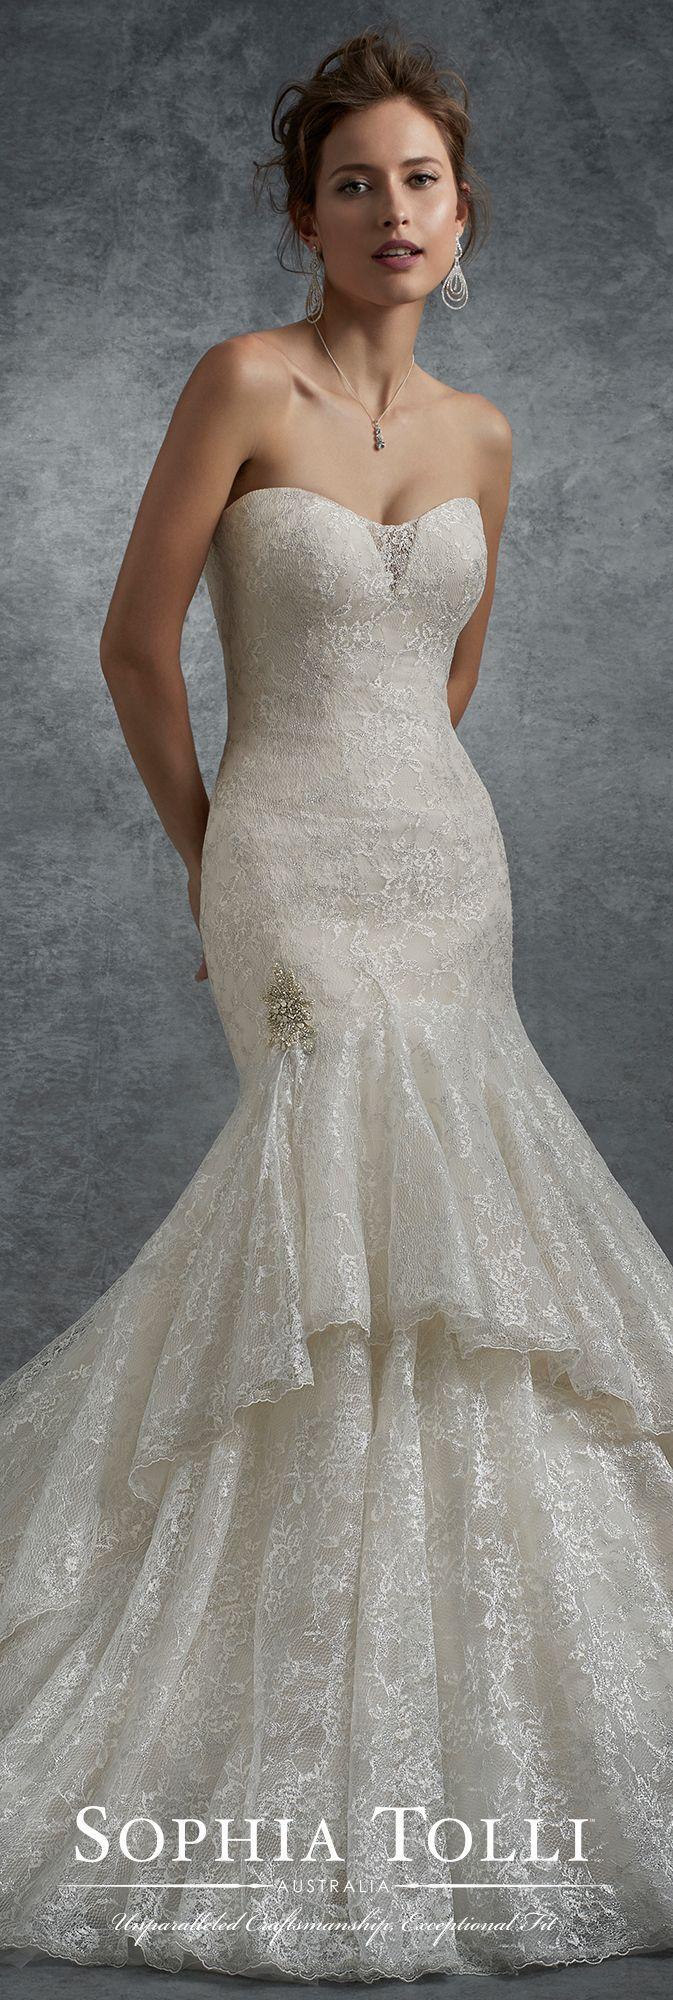 Mariage - Strapless Metallic Lace Trumpet Wedding Dress - Sophia Tolli Y21751